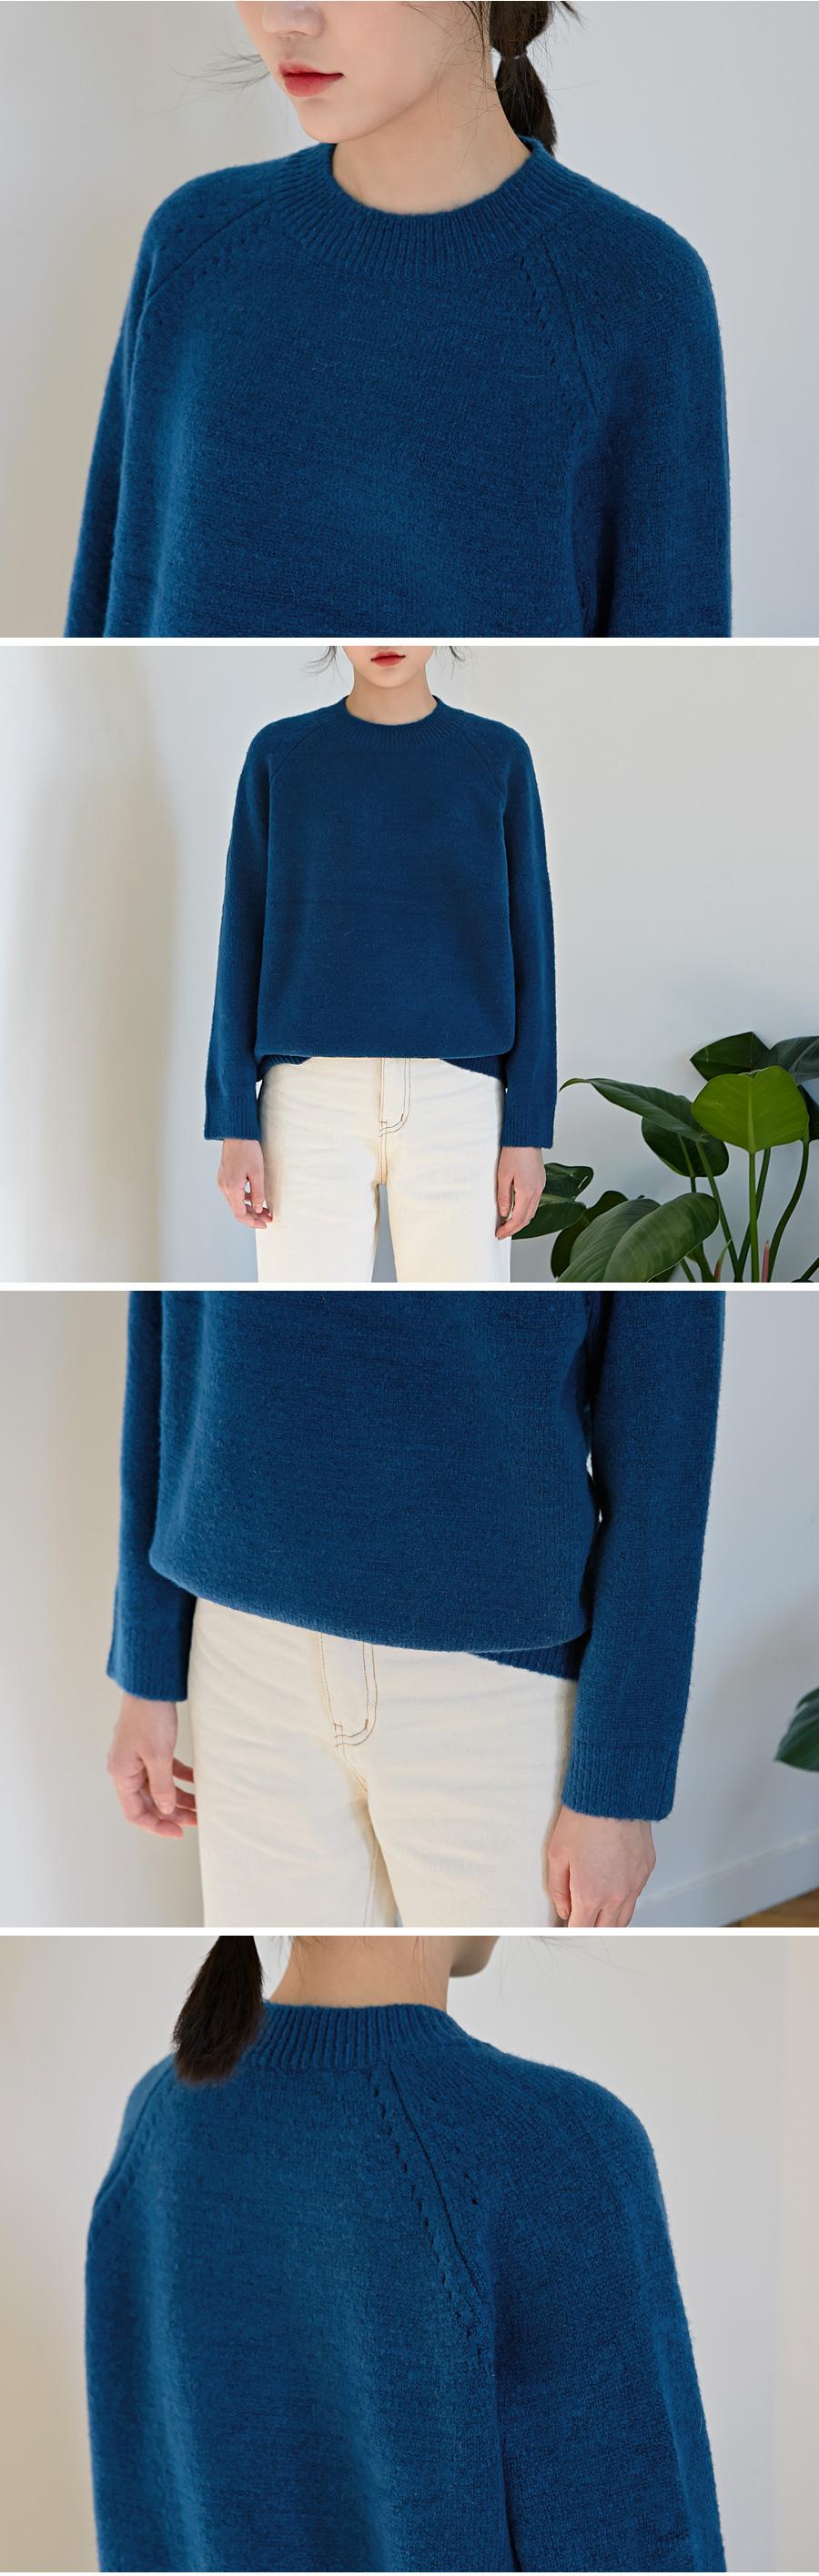 Saint basic knit_S (size : free)